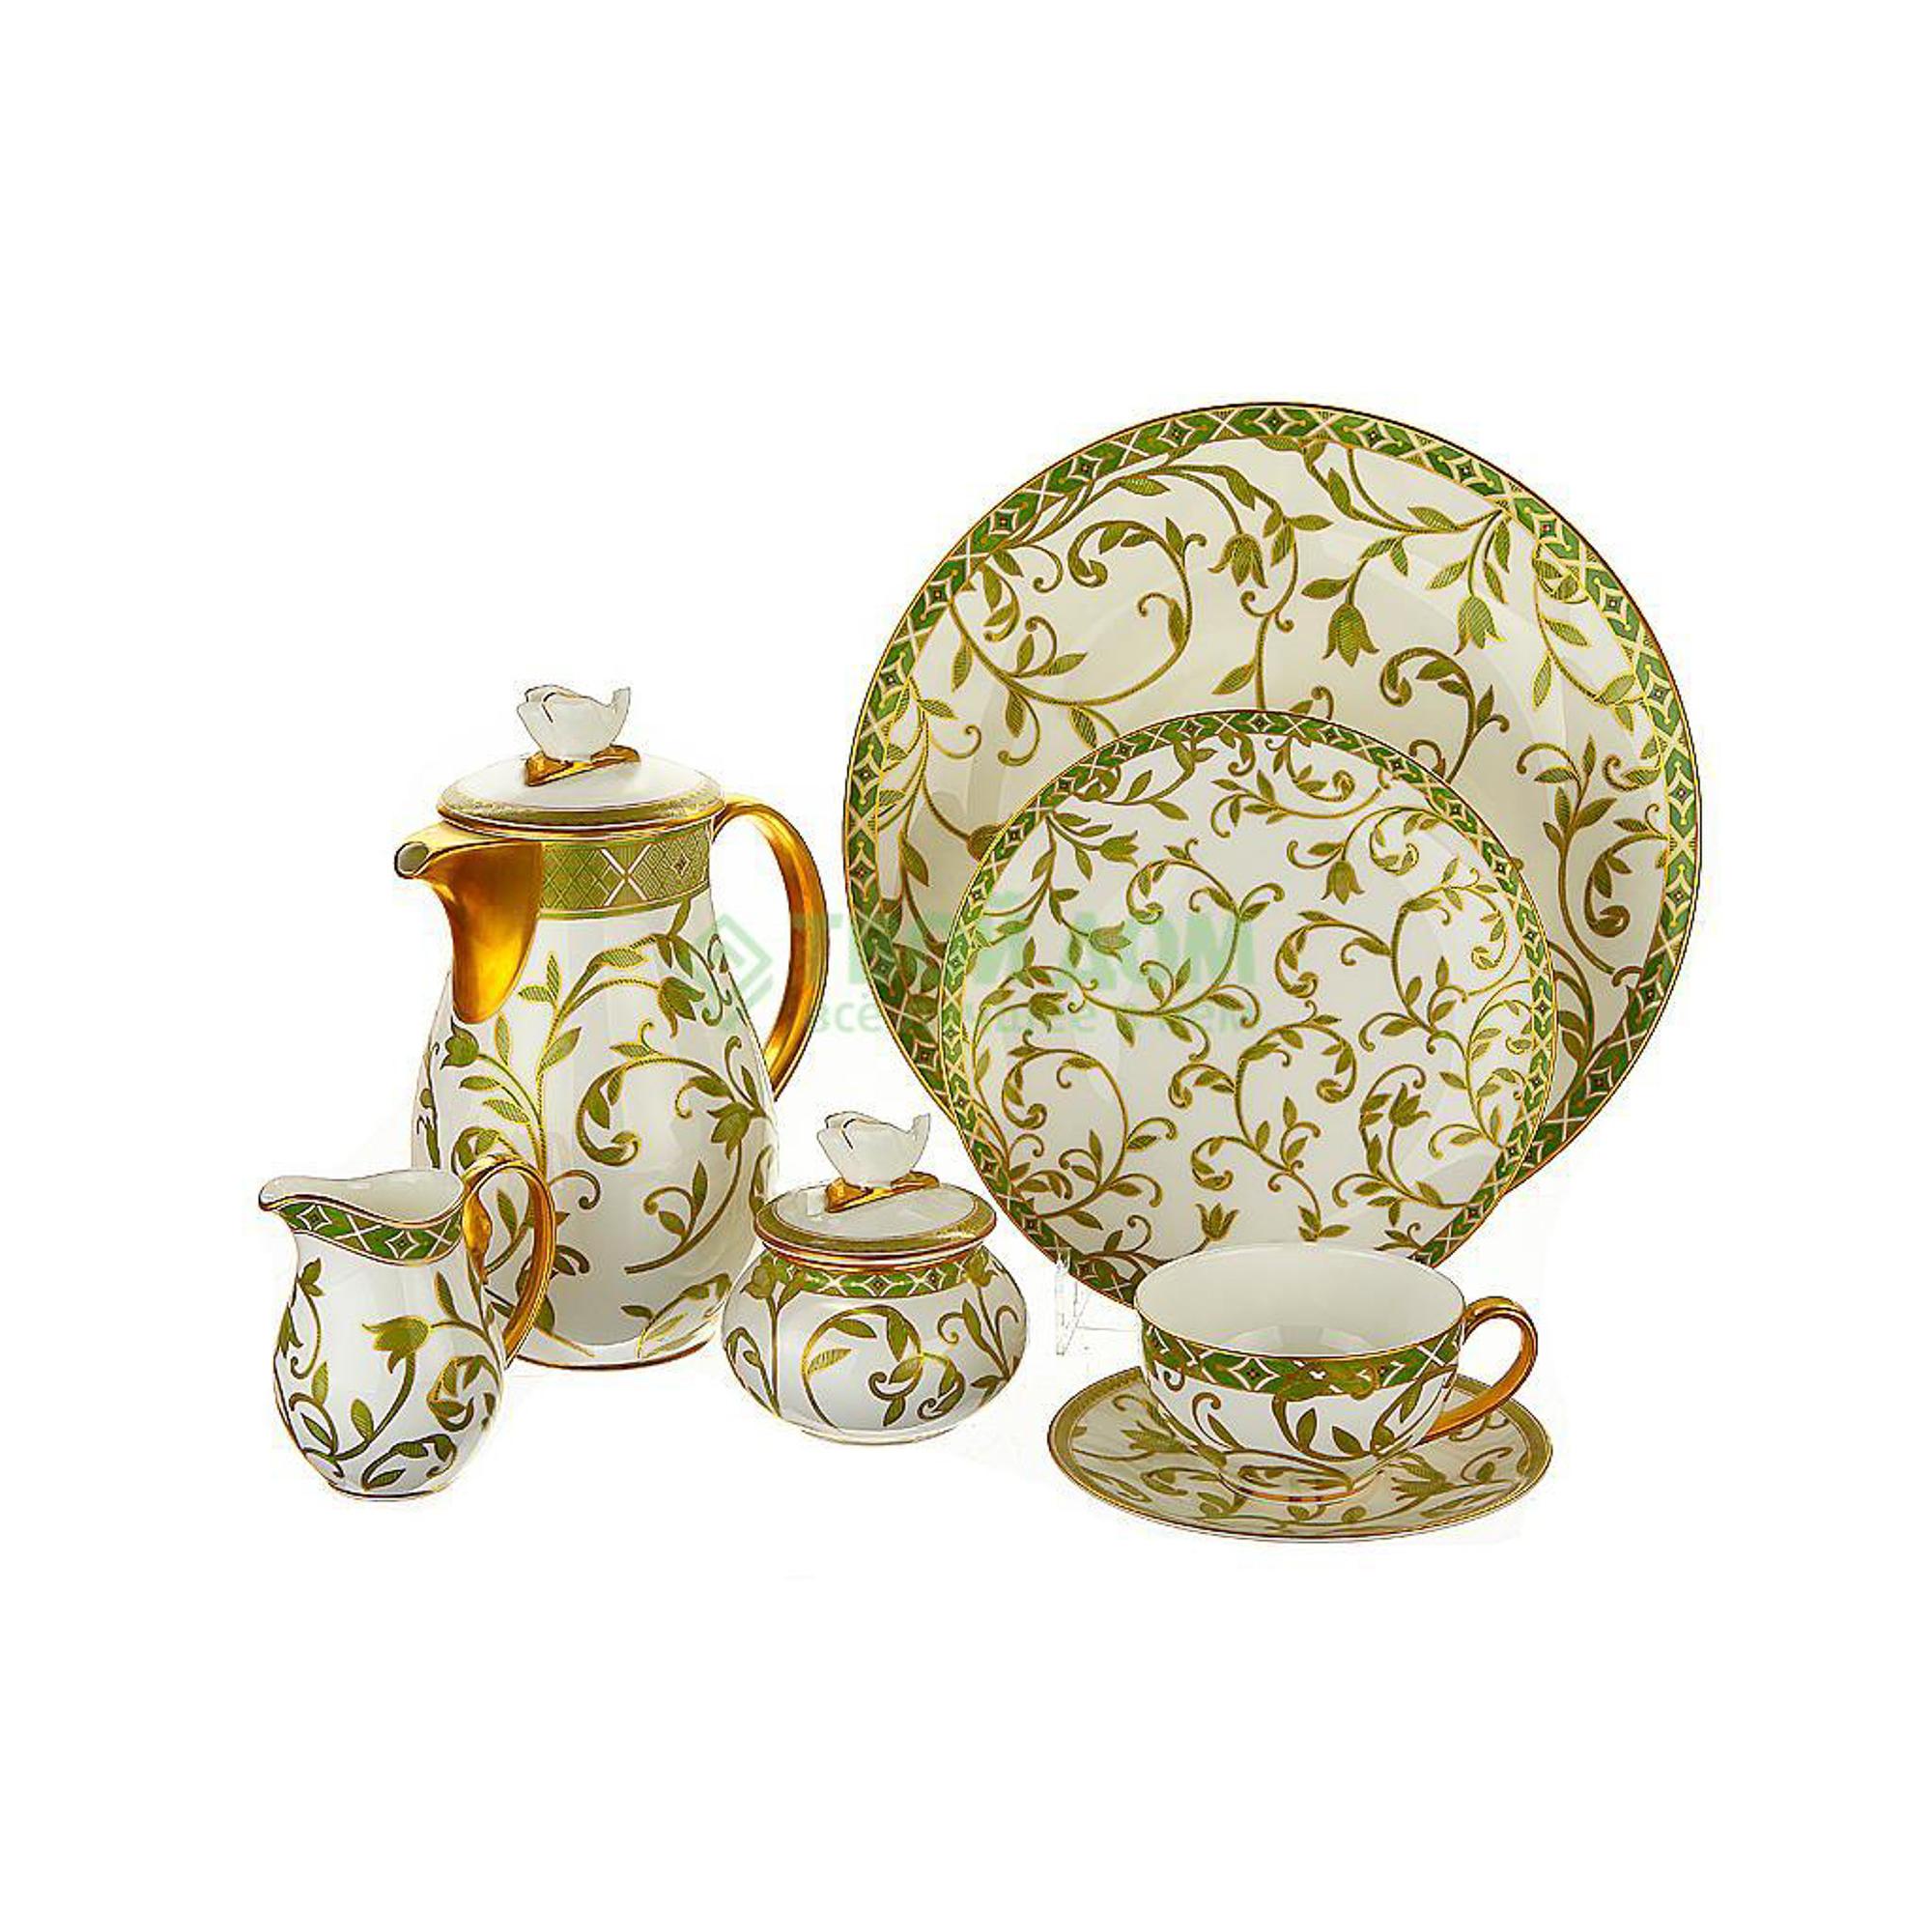 Набор чайный ХАНКУК ПРАУНА НЕОБЕ, 22 предмета 6 персон